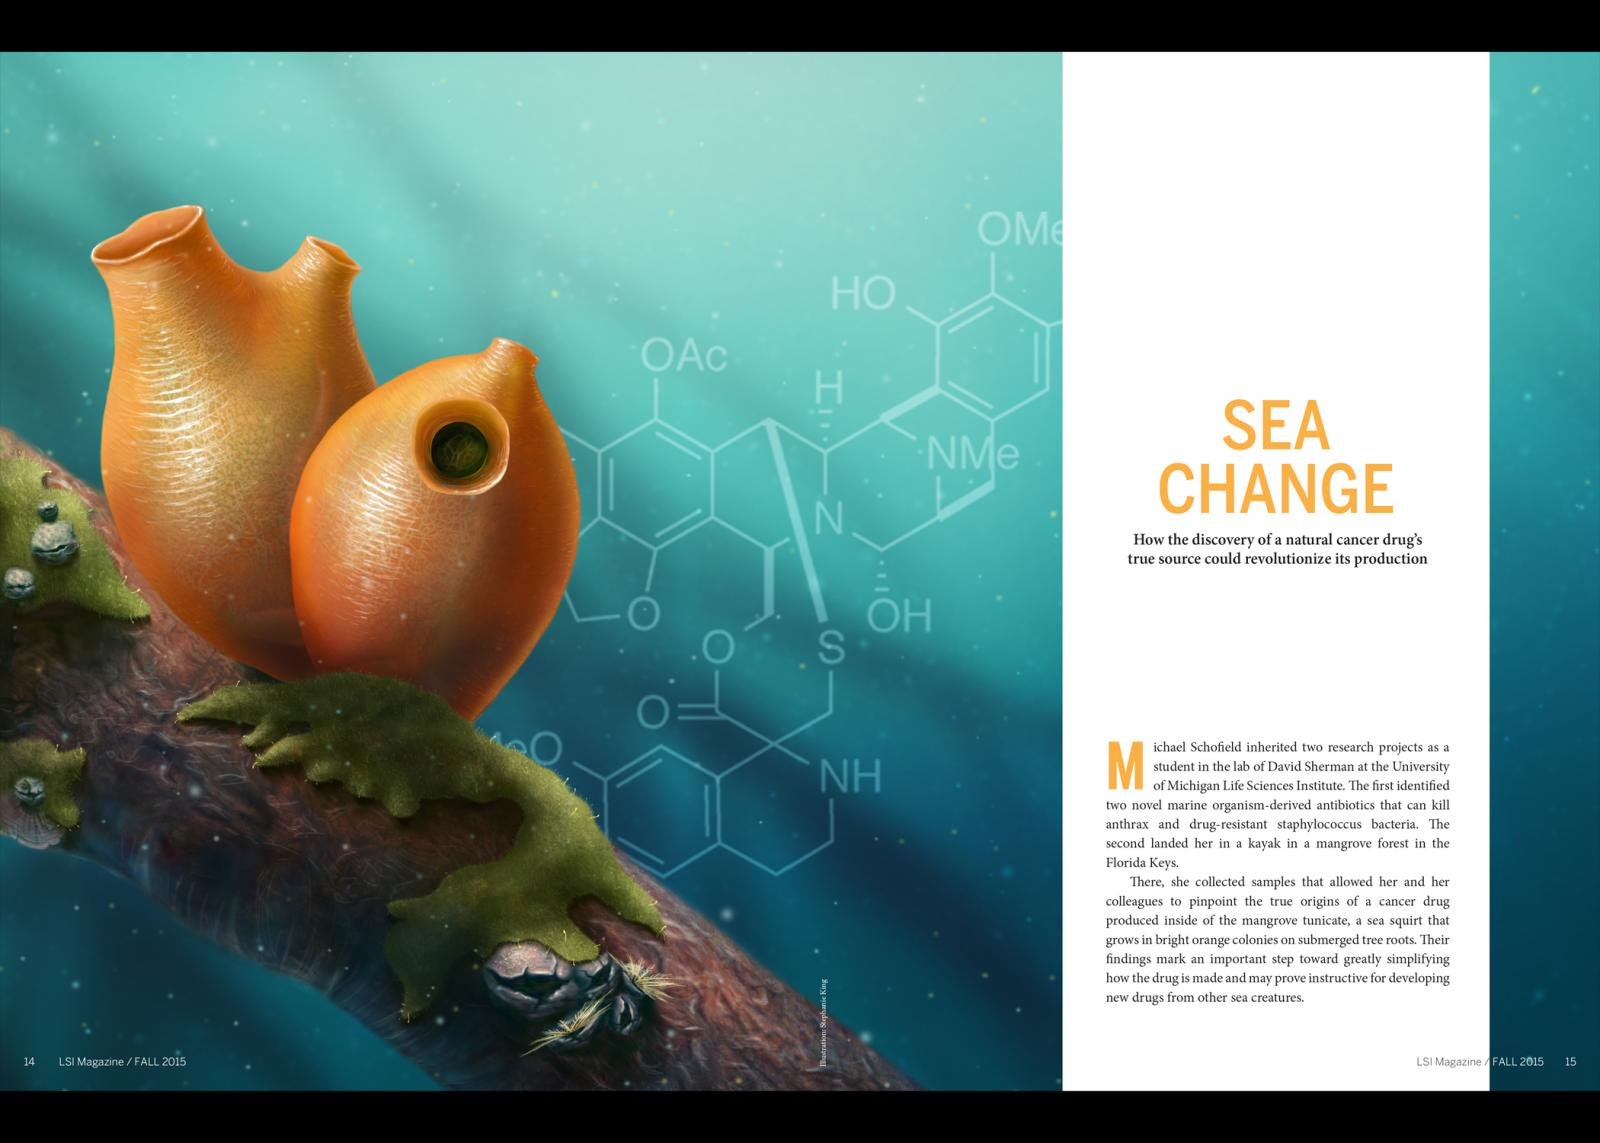 Sea Change Illustration